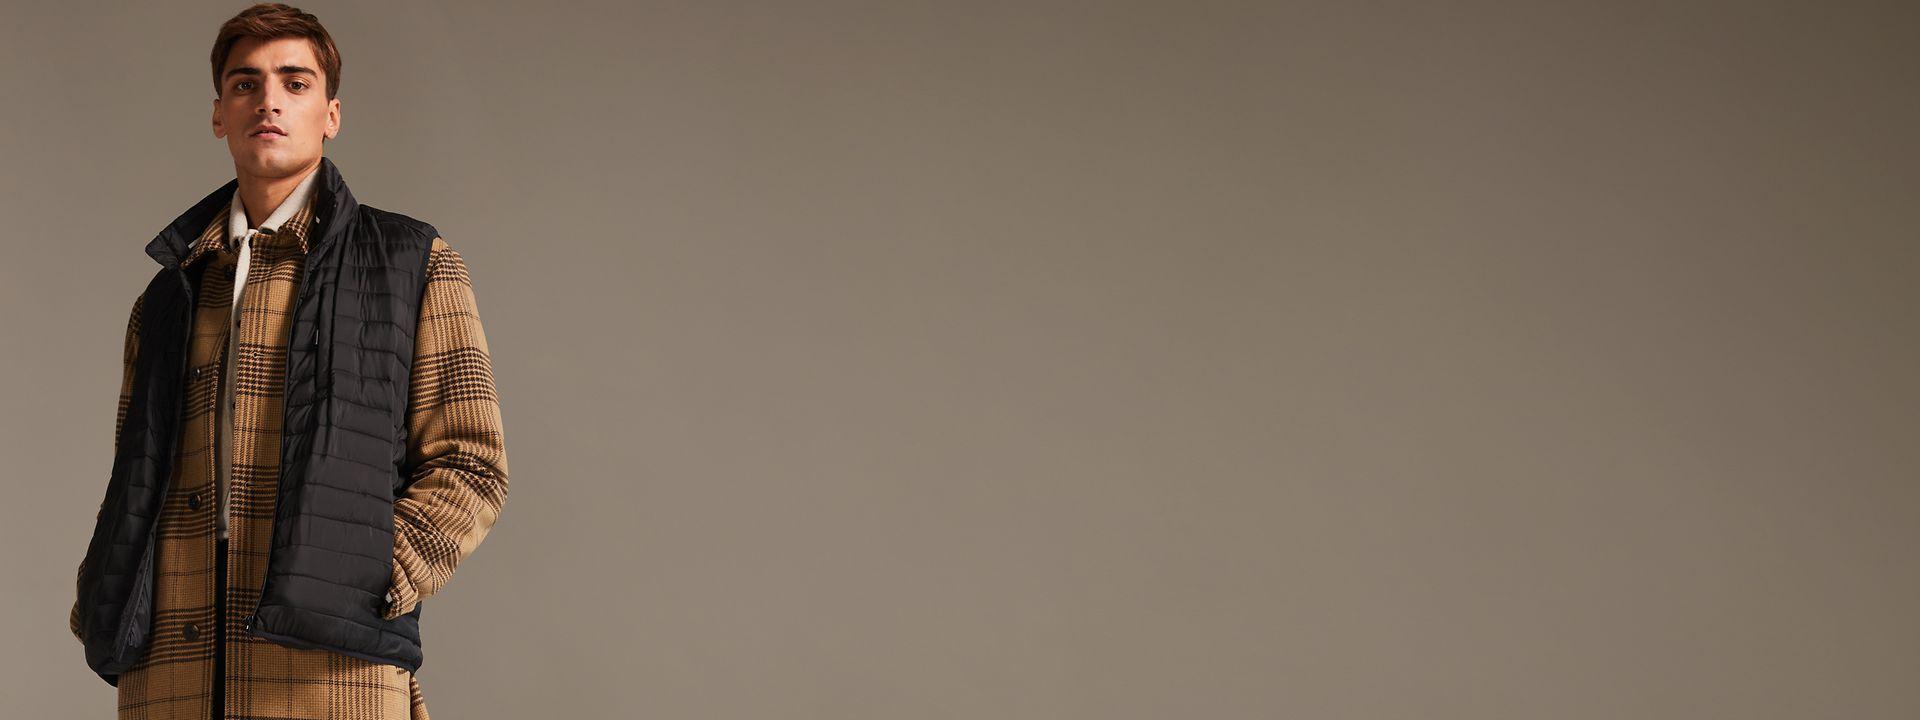 112021--gender---startpage--main-banner--topic---IMG (1)